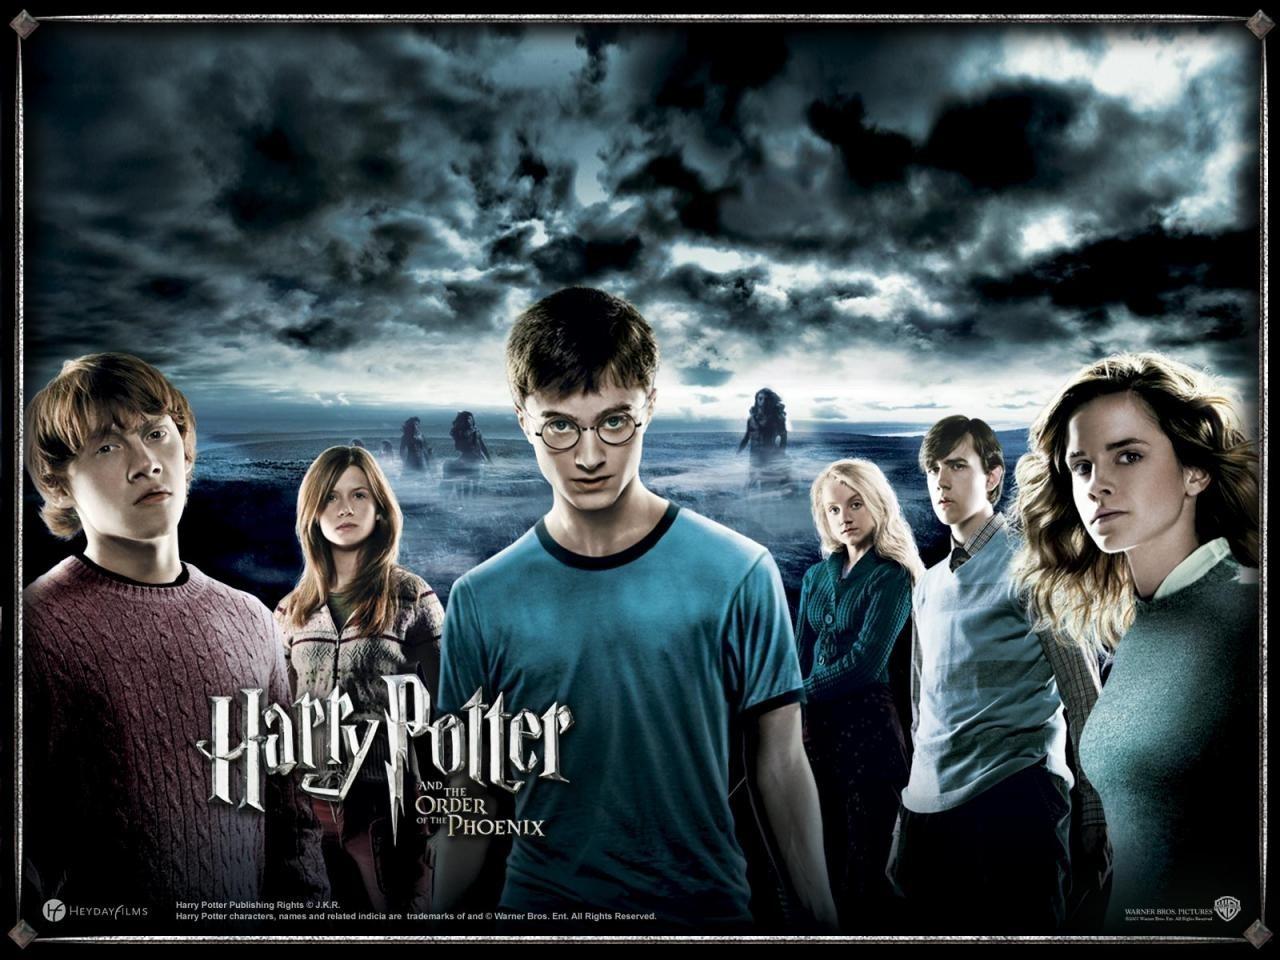 http://3.bp.blogspot.com/-OToEiO8Gh1Y/ThNaYT1CpAI/AAAAAAAAAKE/ICMessTR4-E/s1600/Harry+Potter.jpg